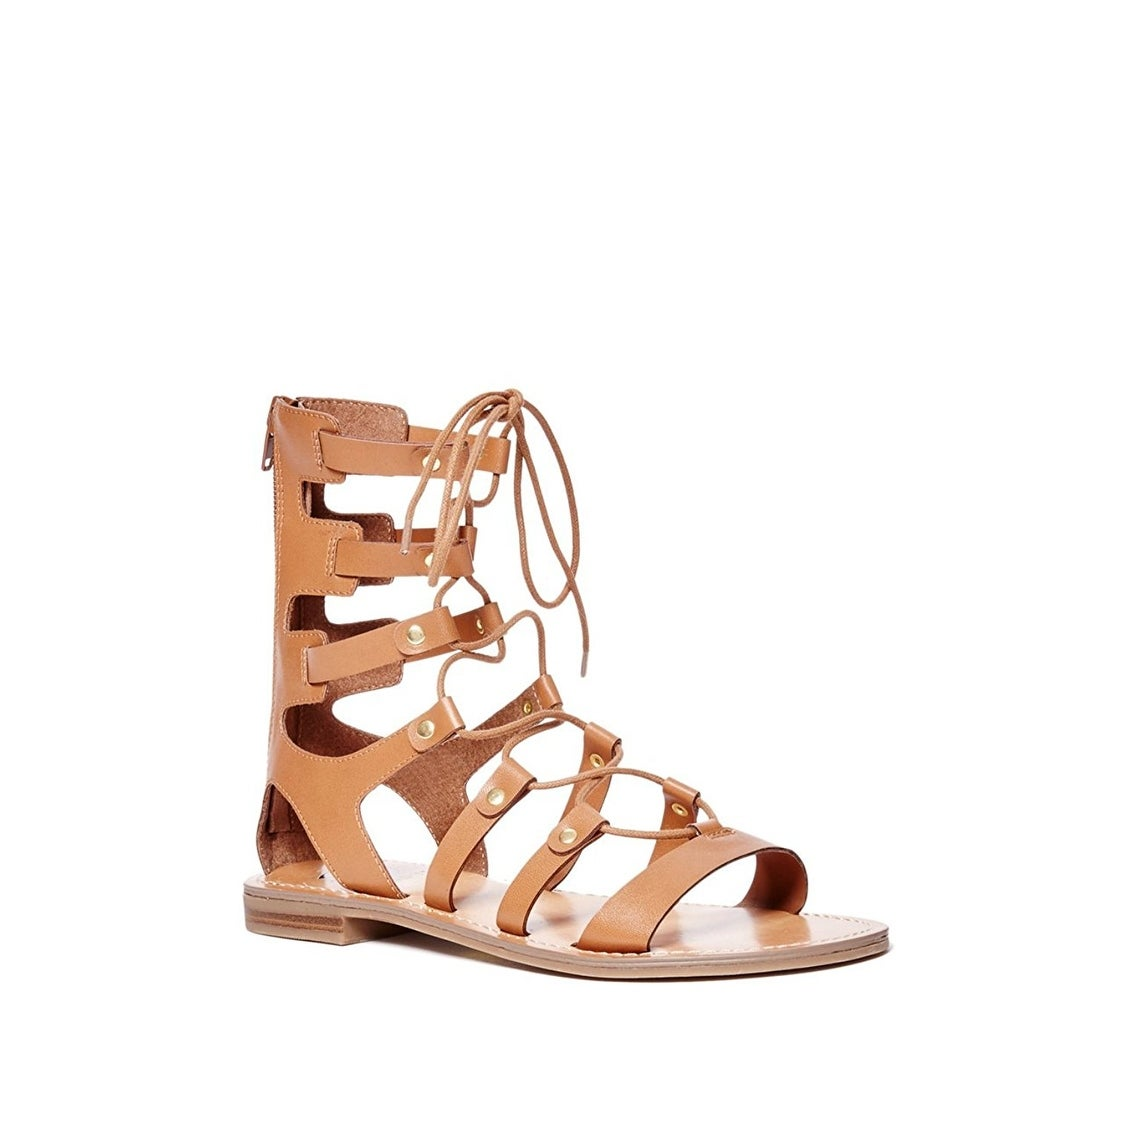 00564d685f4287 Shop Guess Clothing   Shoes